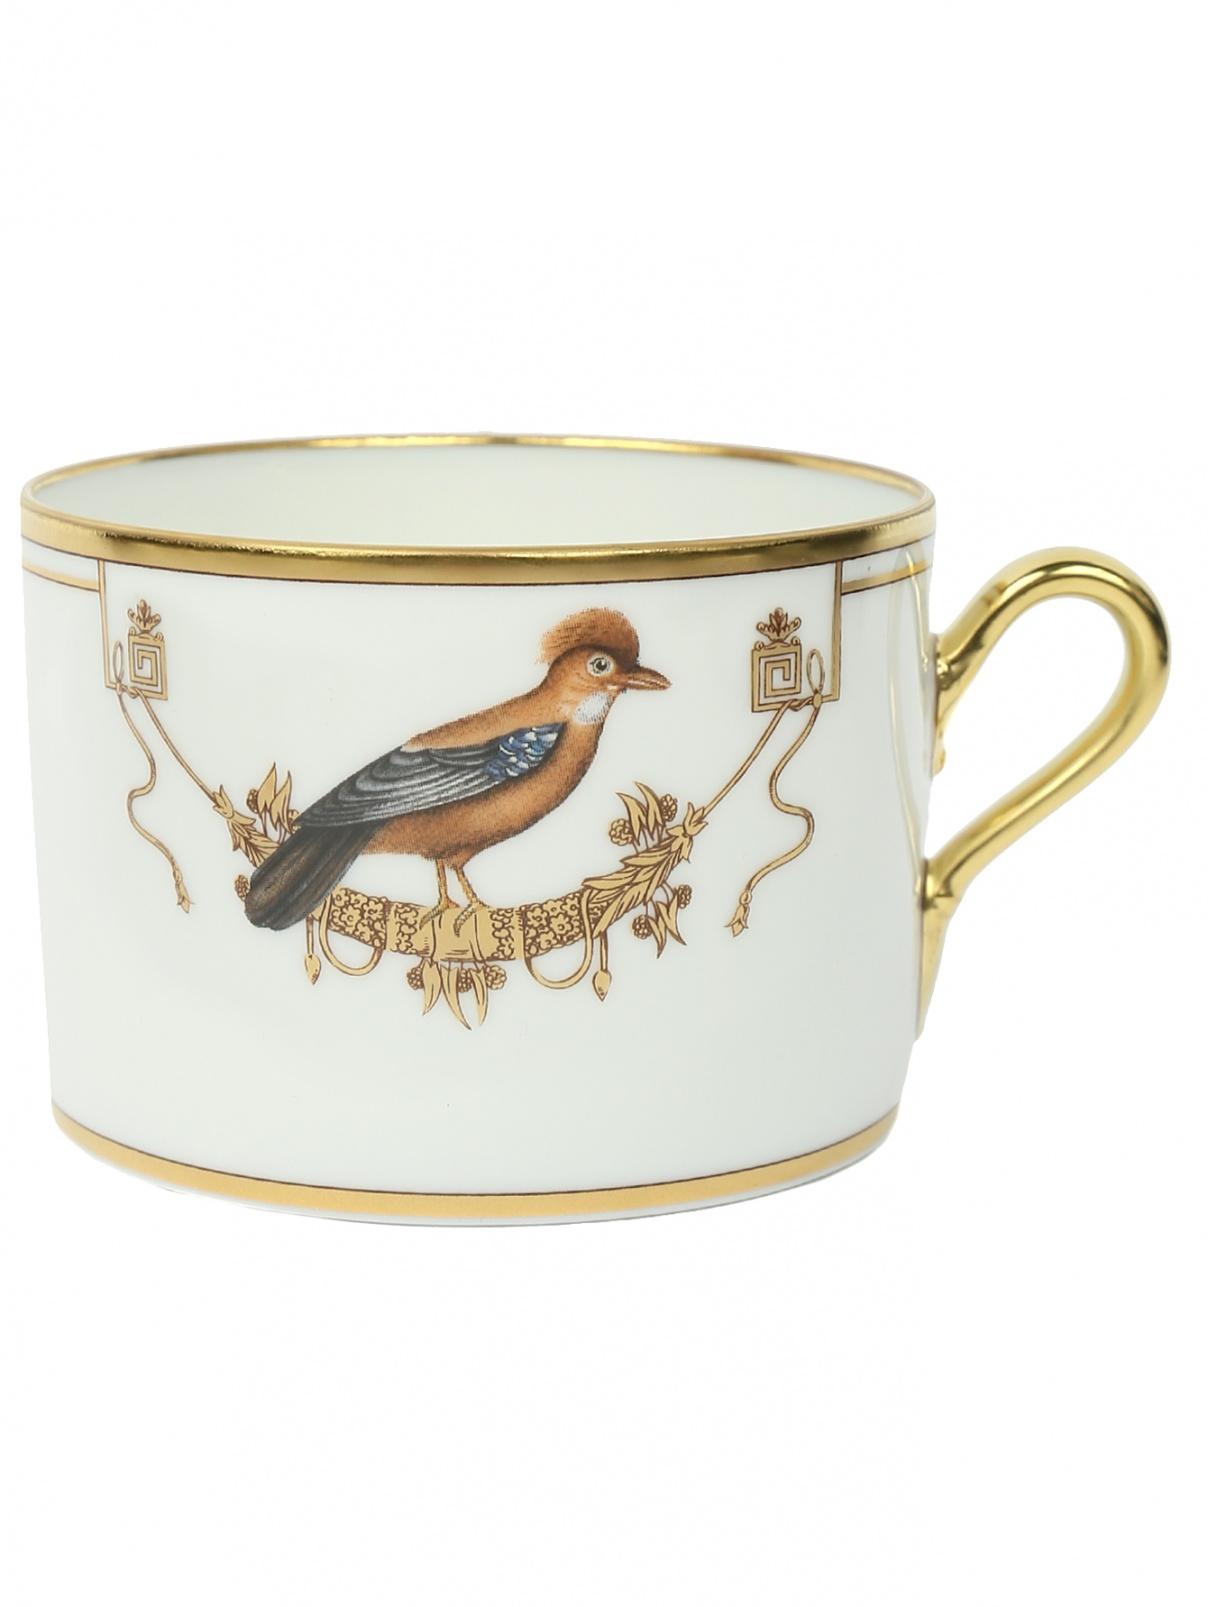 Чашка чайная с узором птицы Richard Ginori 1735  –  Общий вид